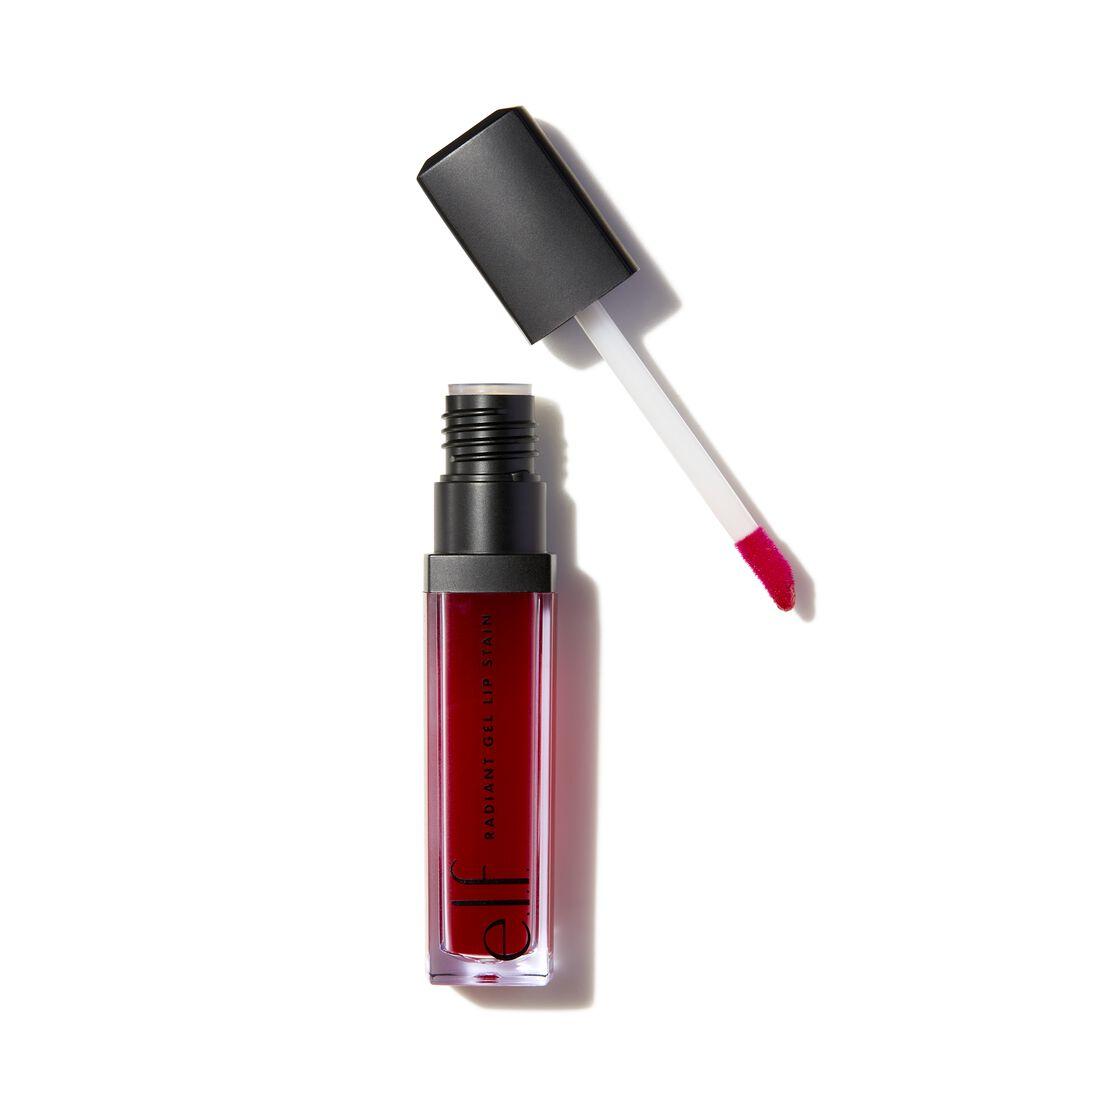 ELF Cosmetics - Radiant Gel Lip Stain